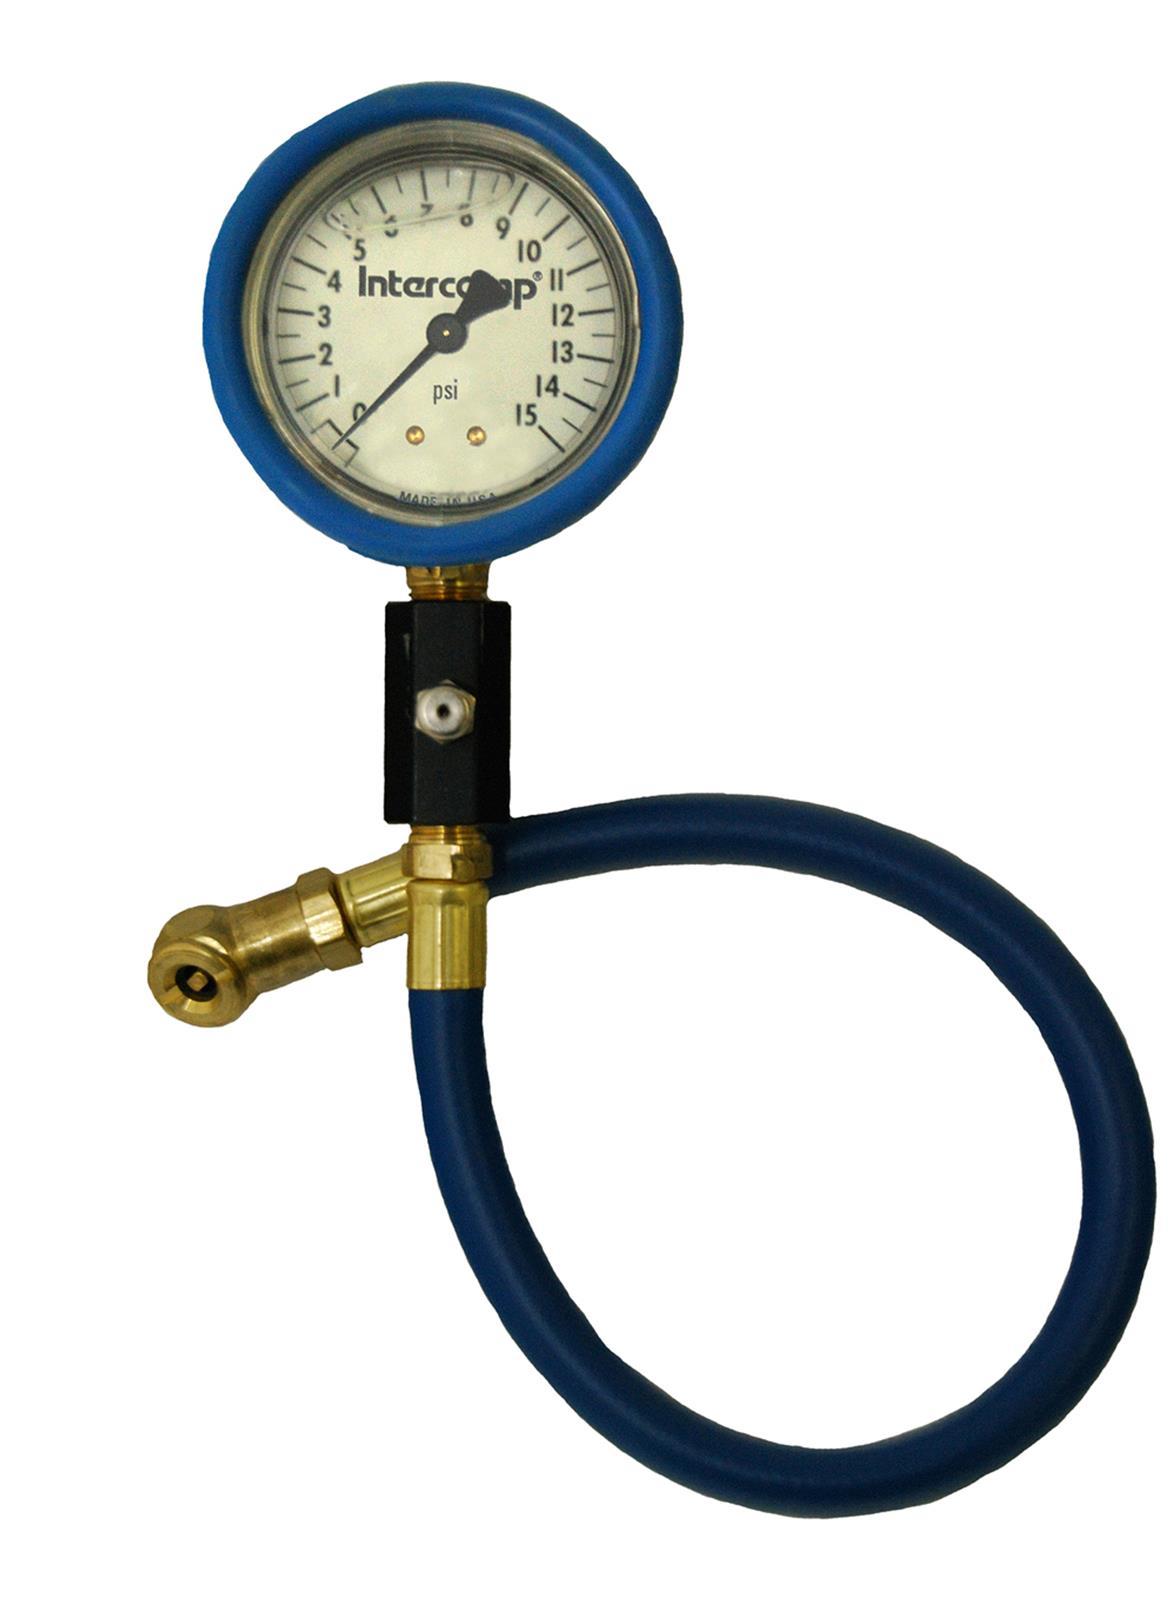 intercomp racing air pressure gauge 360065 ebay. Black Bedroom Furniture Sets. Home Design Ideas